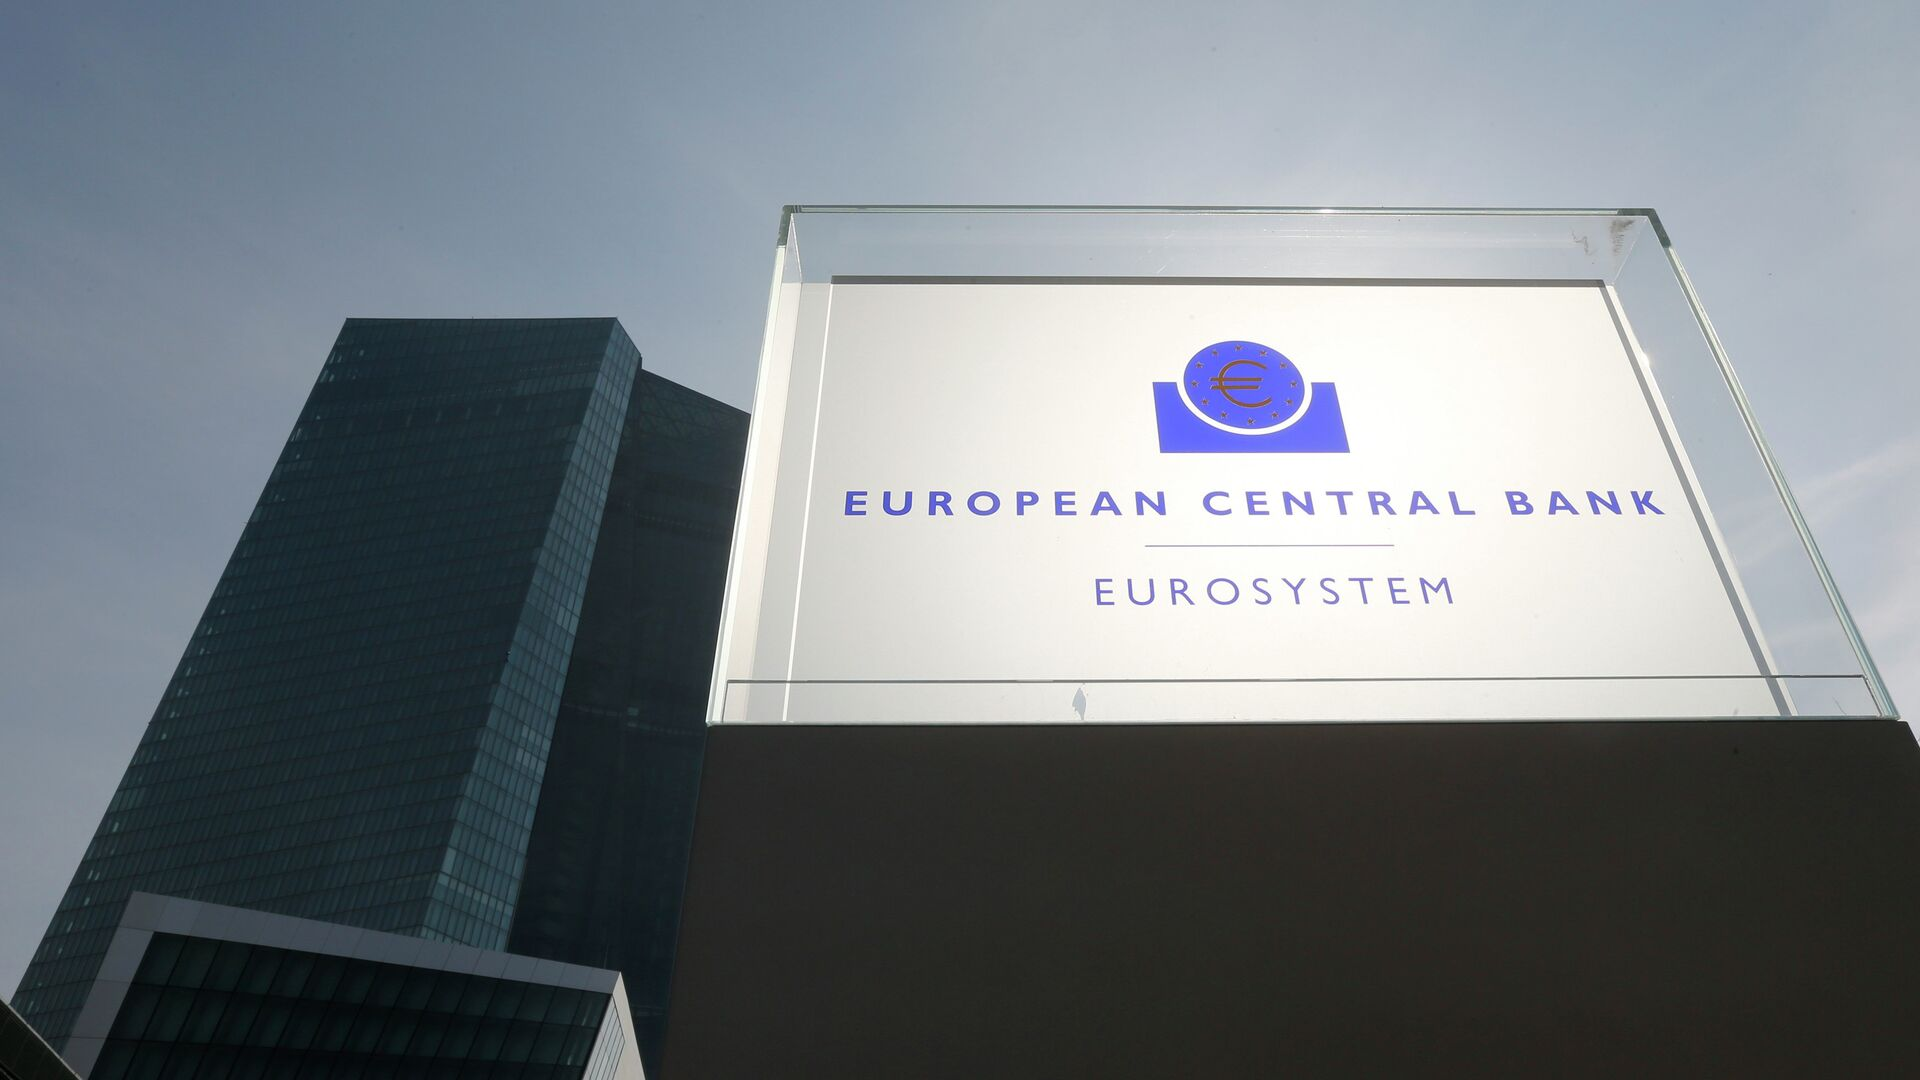 La sede dellas BCE a Francoforte - Sputnik Italia, 1920, 24.06.2021